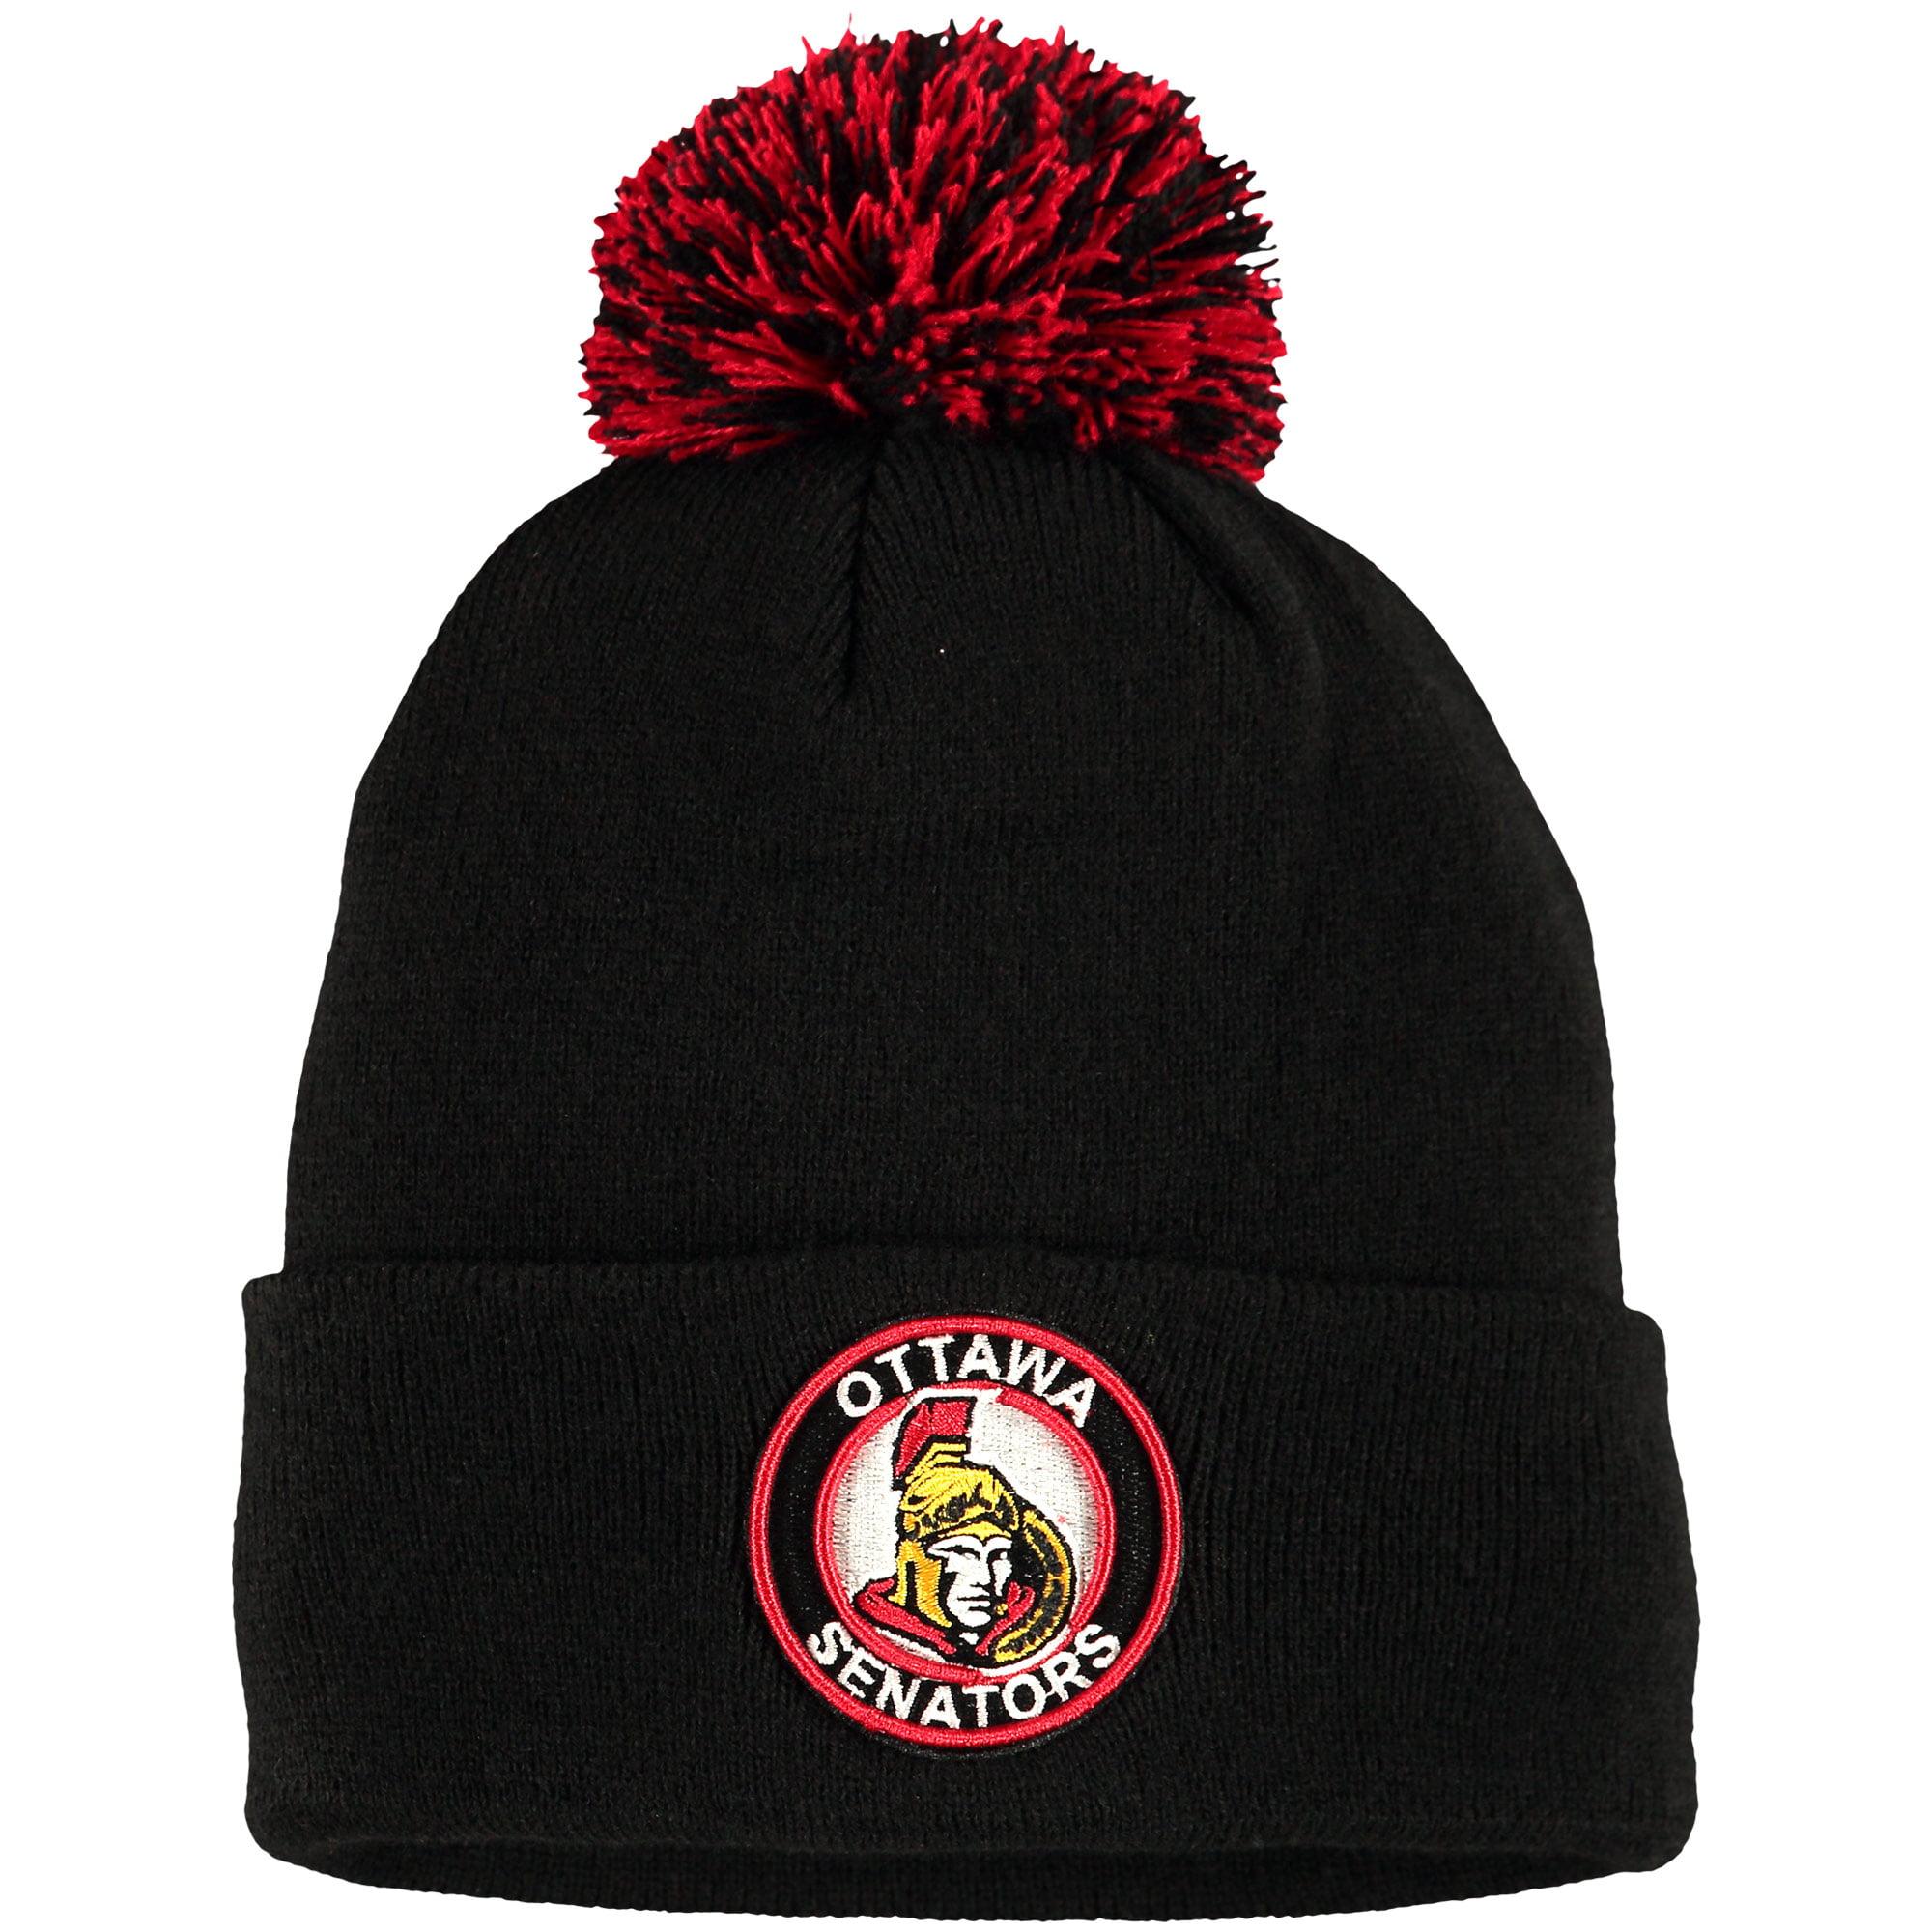 Ottawa Senators Zephyr Seal Cuffed Knit Hat - Black - OSFA